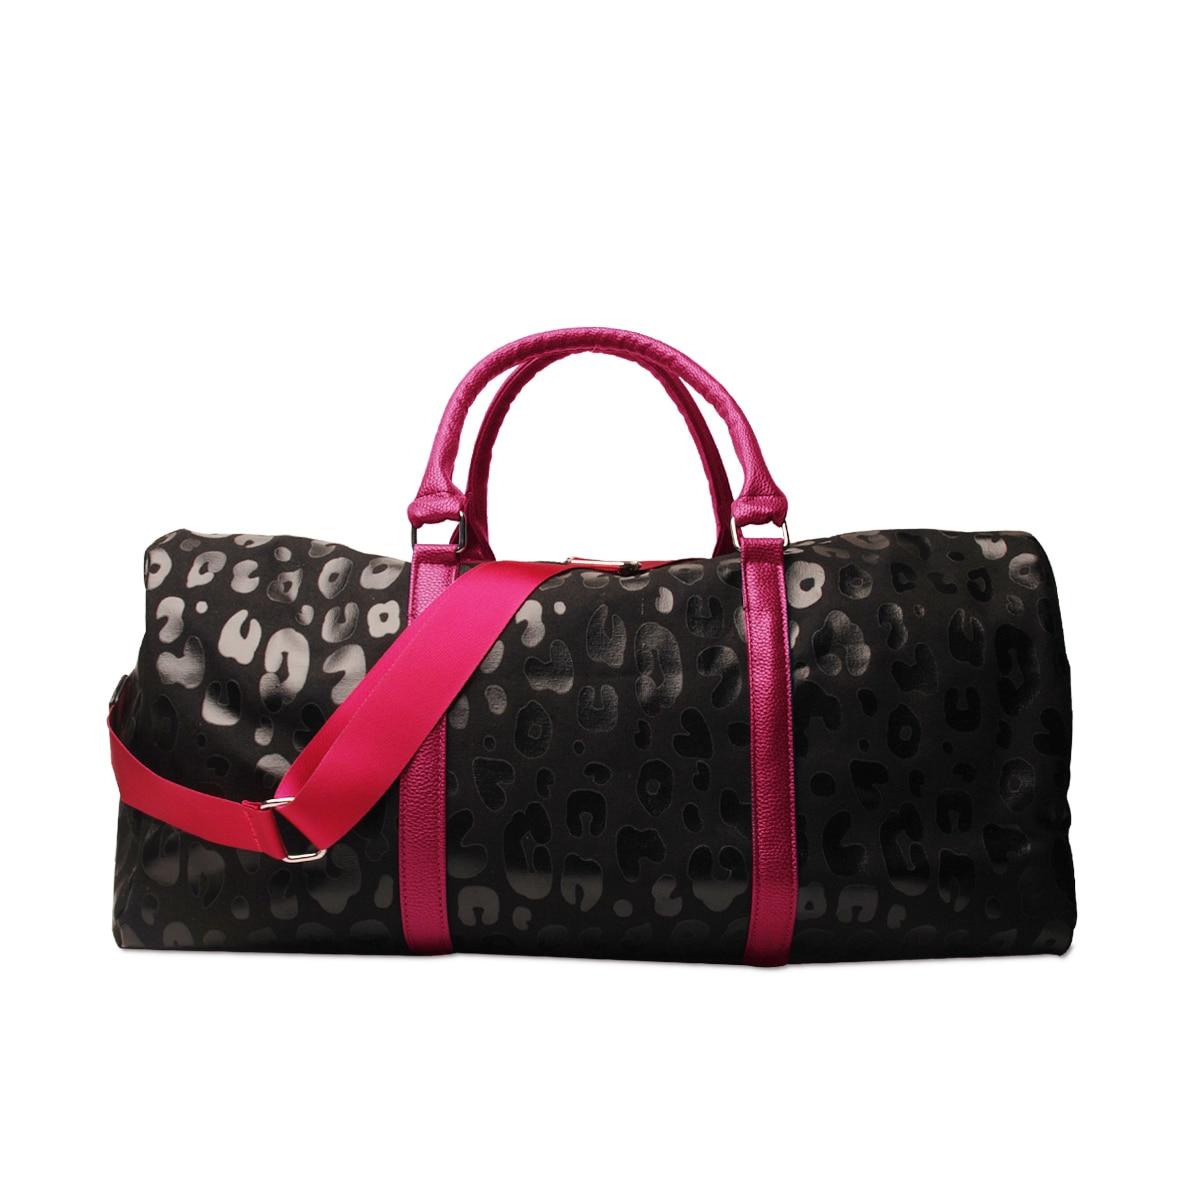 DOMIL الساخن الأسود ليوبارد تصميم سعة كبيرة بو عطلة نهاية الأسبوع حقائب قماش السفر التسوق مخلب محفظة لا نهاية لها حمل حقيبة 1111065